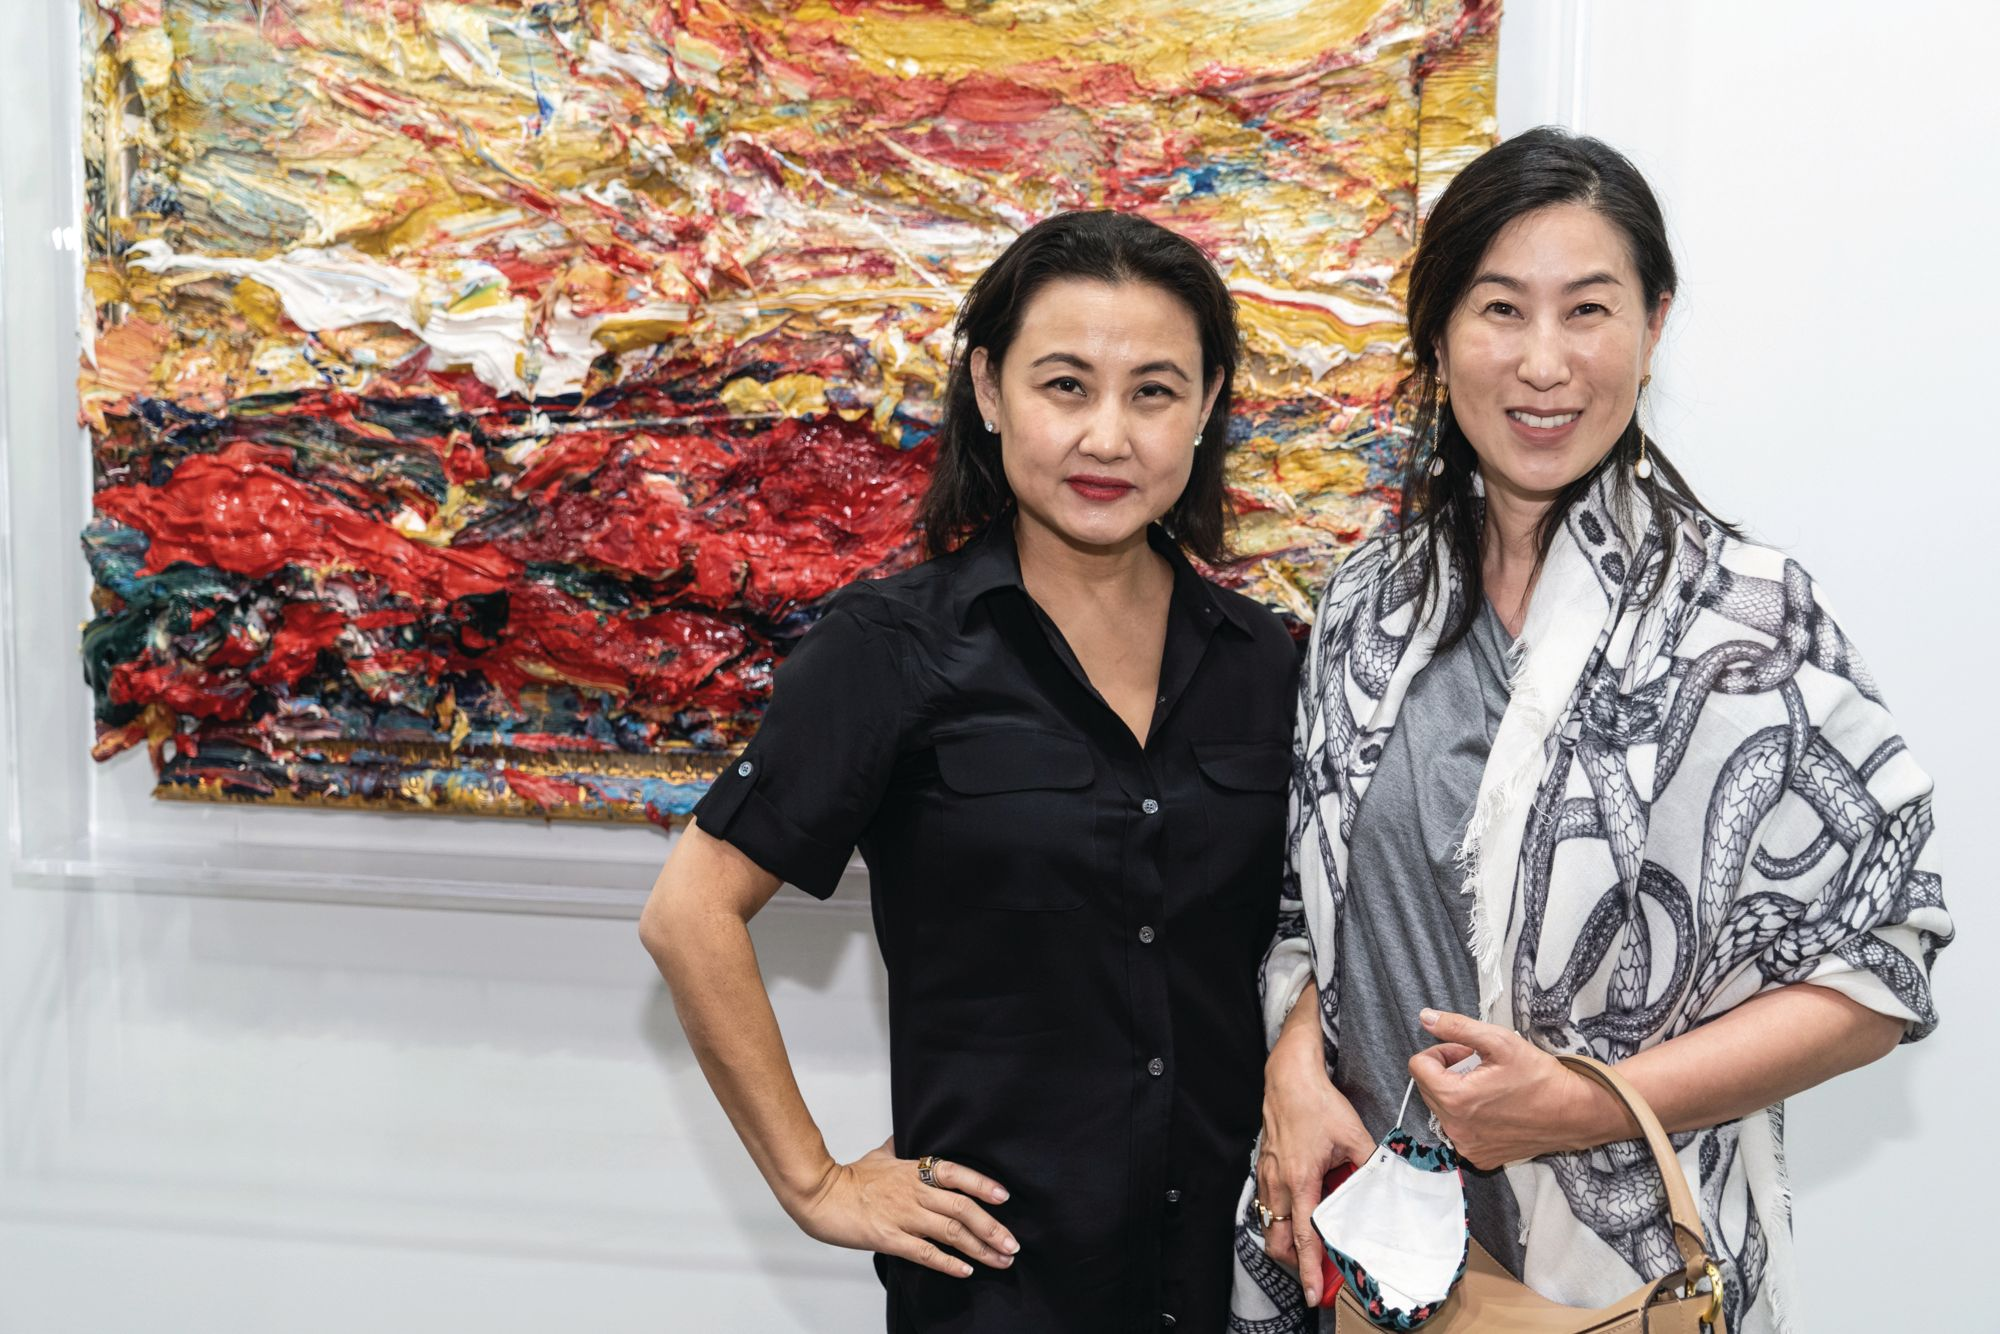 Spotlight by Art Basel 2020 Showcases Art During The Pandemic